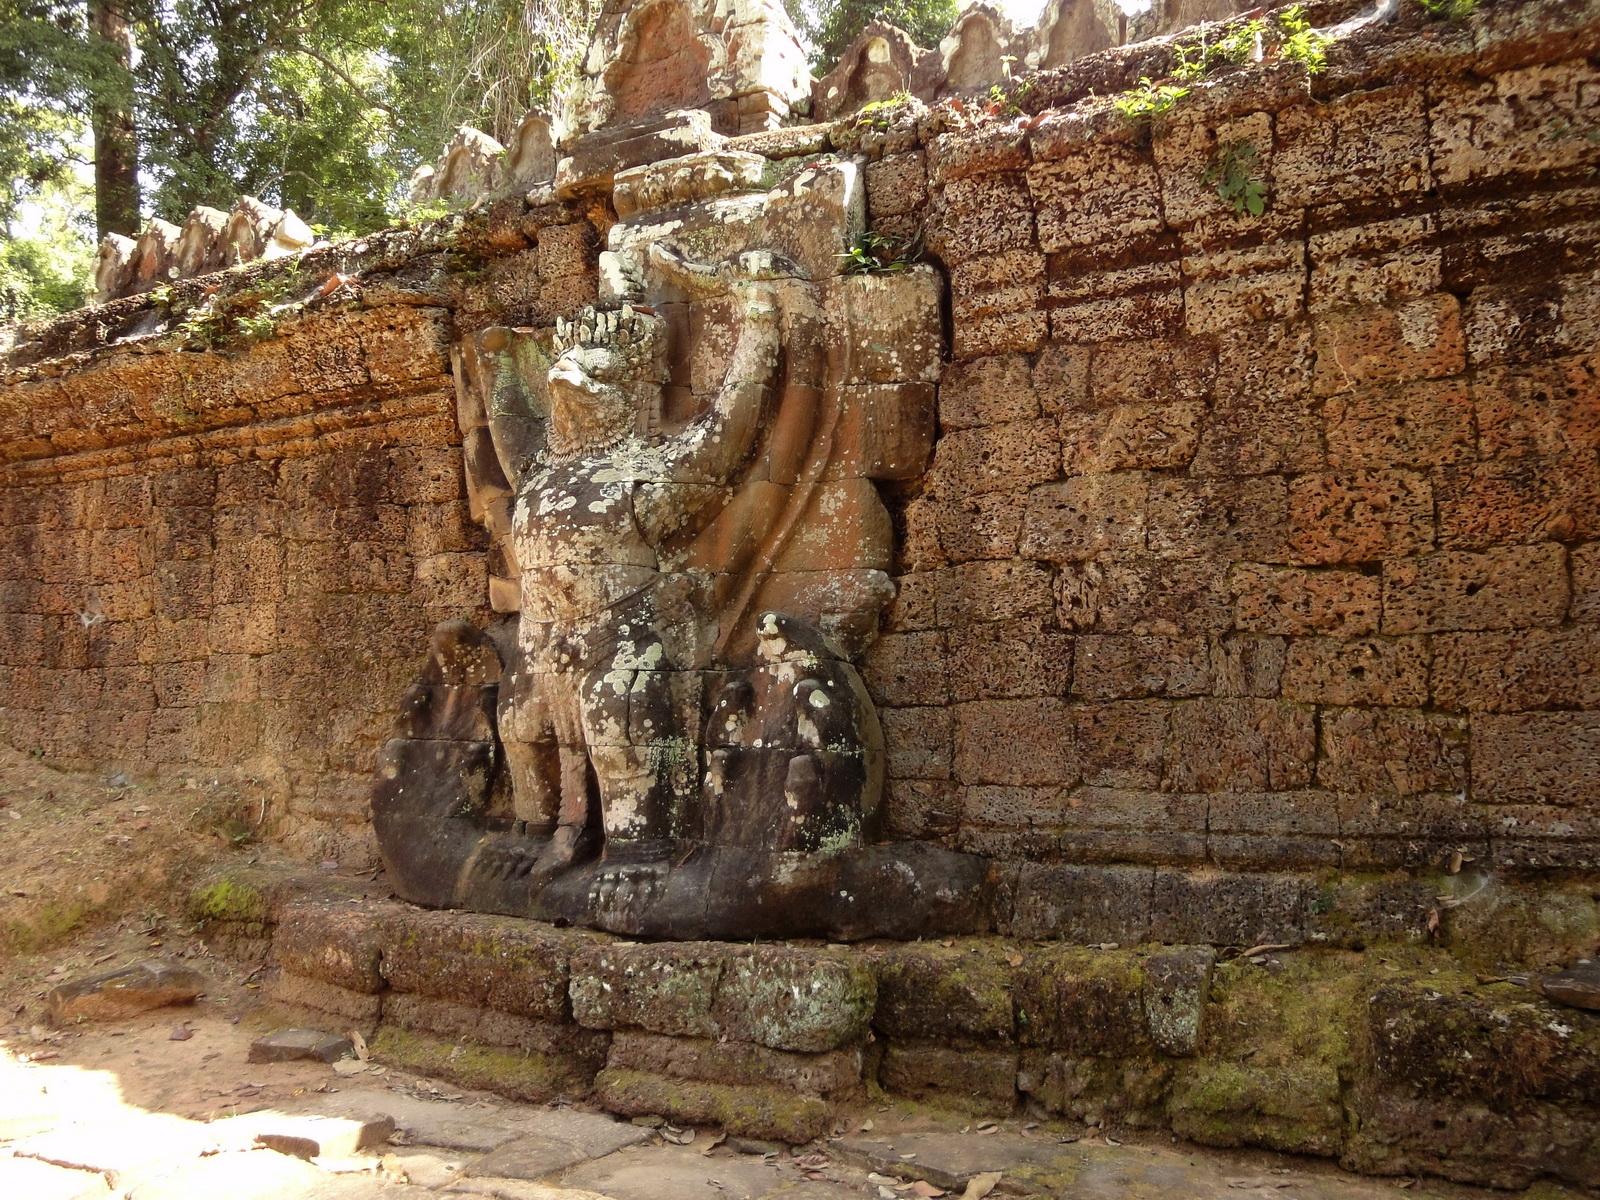 Preah Khan Temple 4th wall enclosure 5m Garuda holding Nagas 02